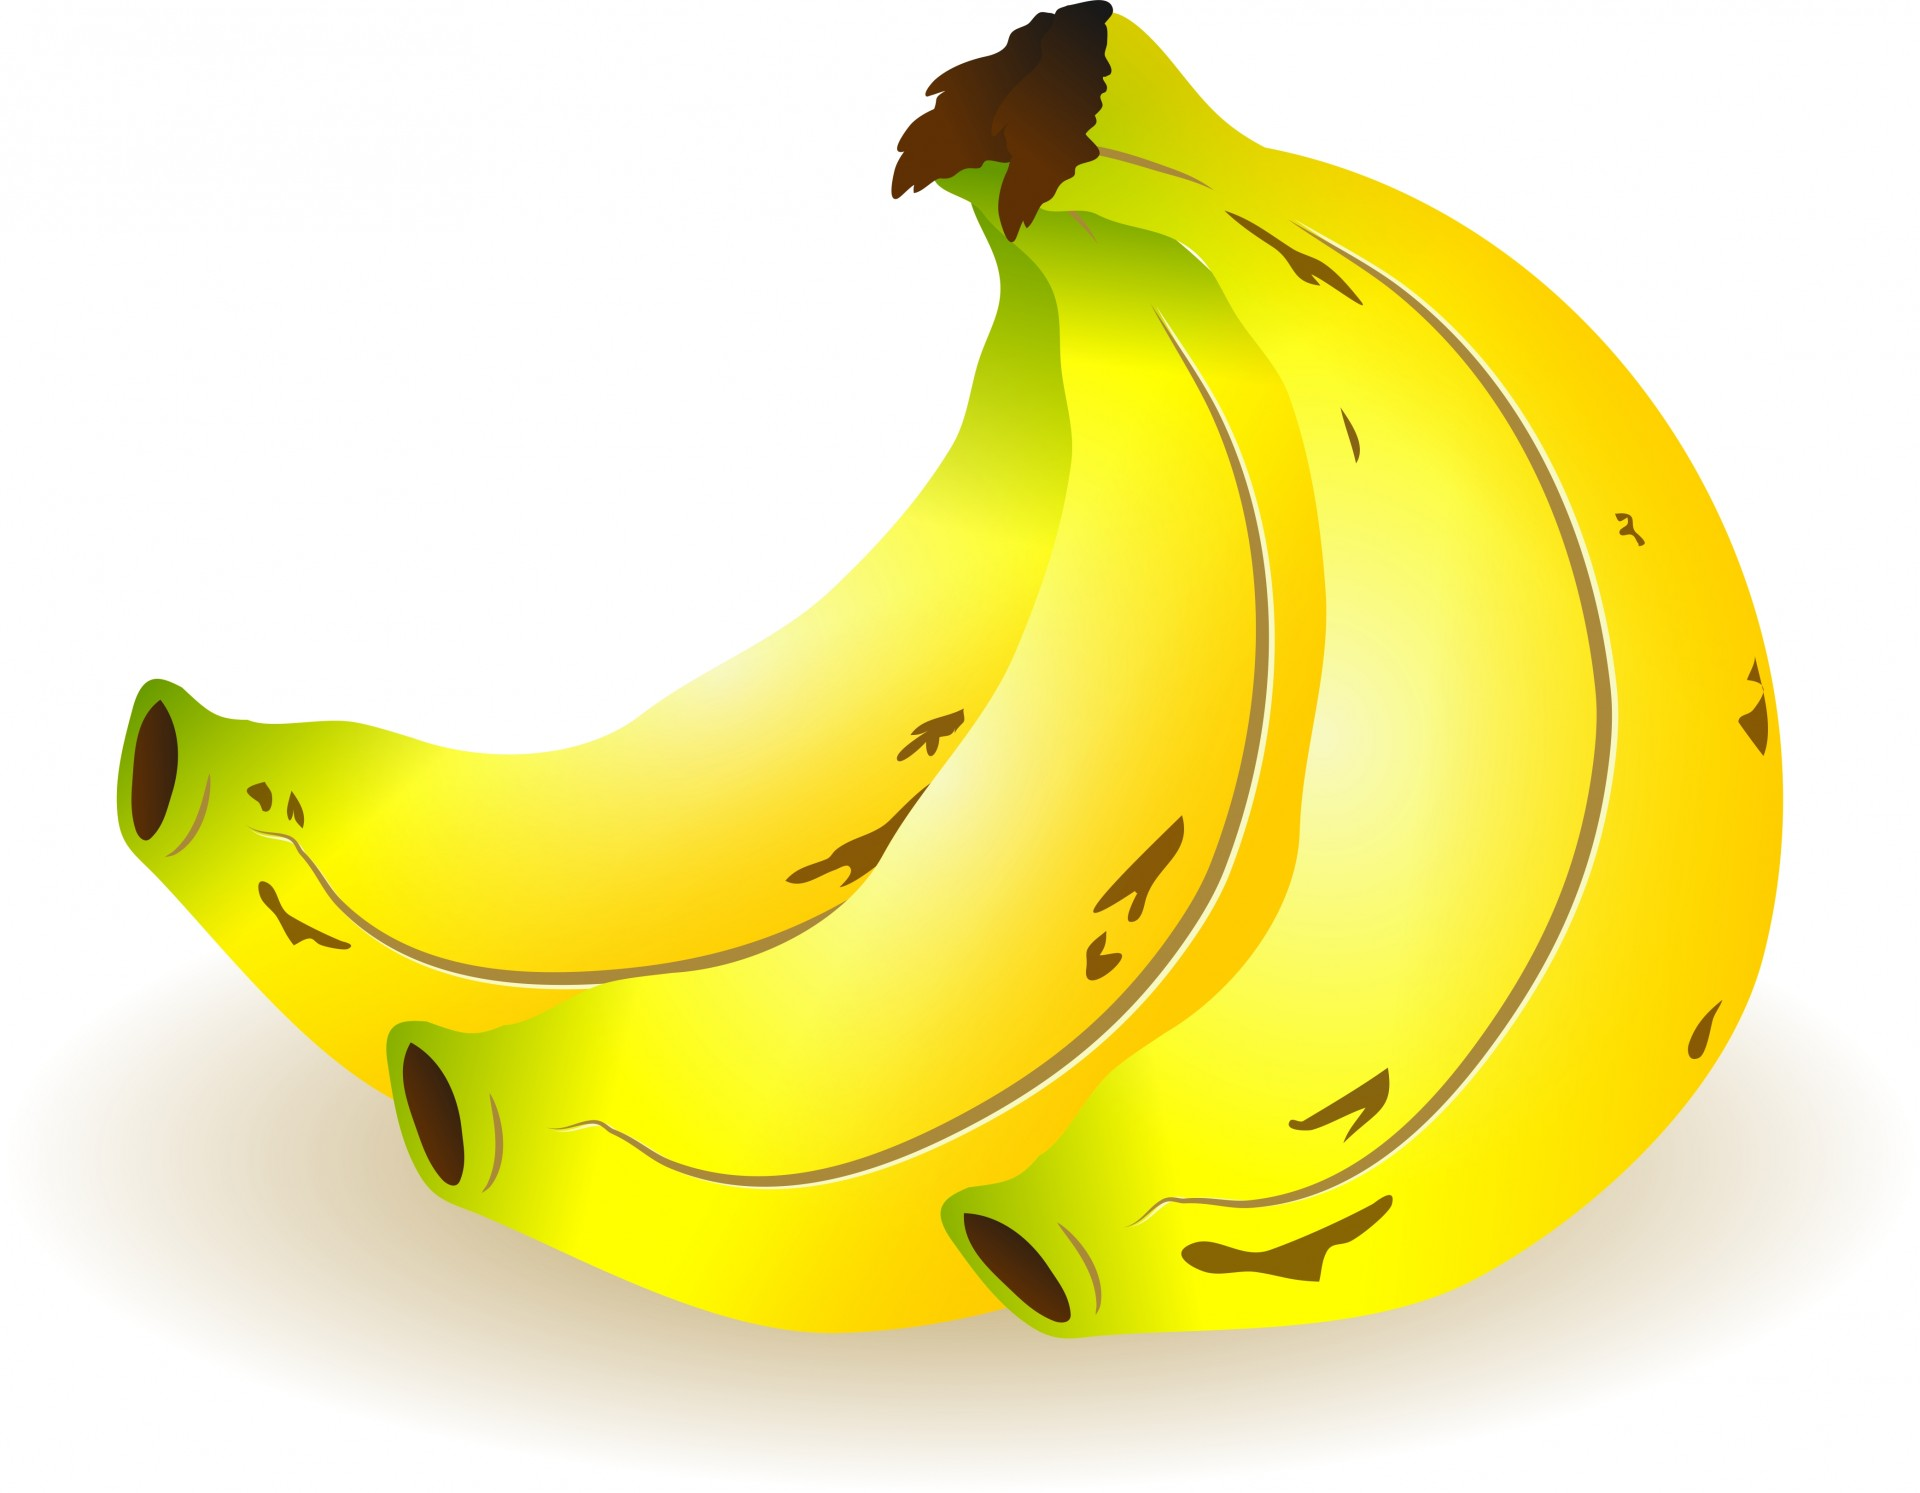 Bunch Of Bananas Free Stock Photo.